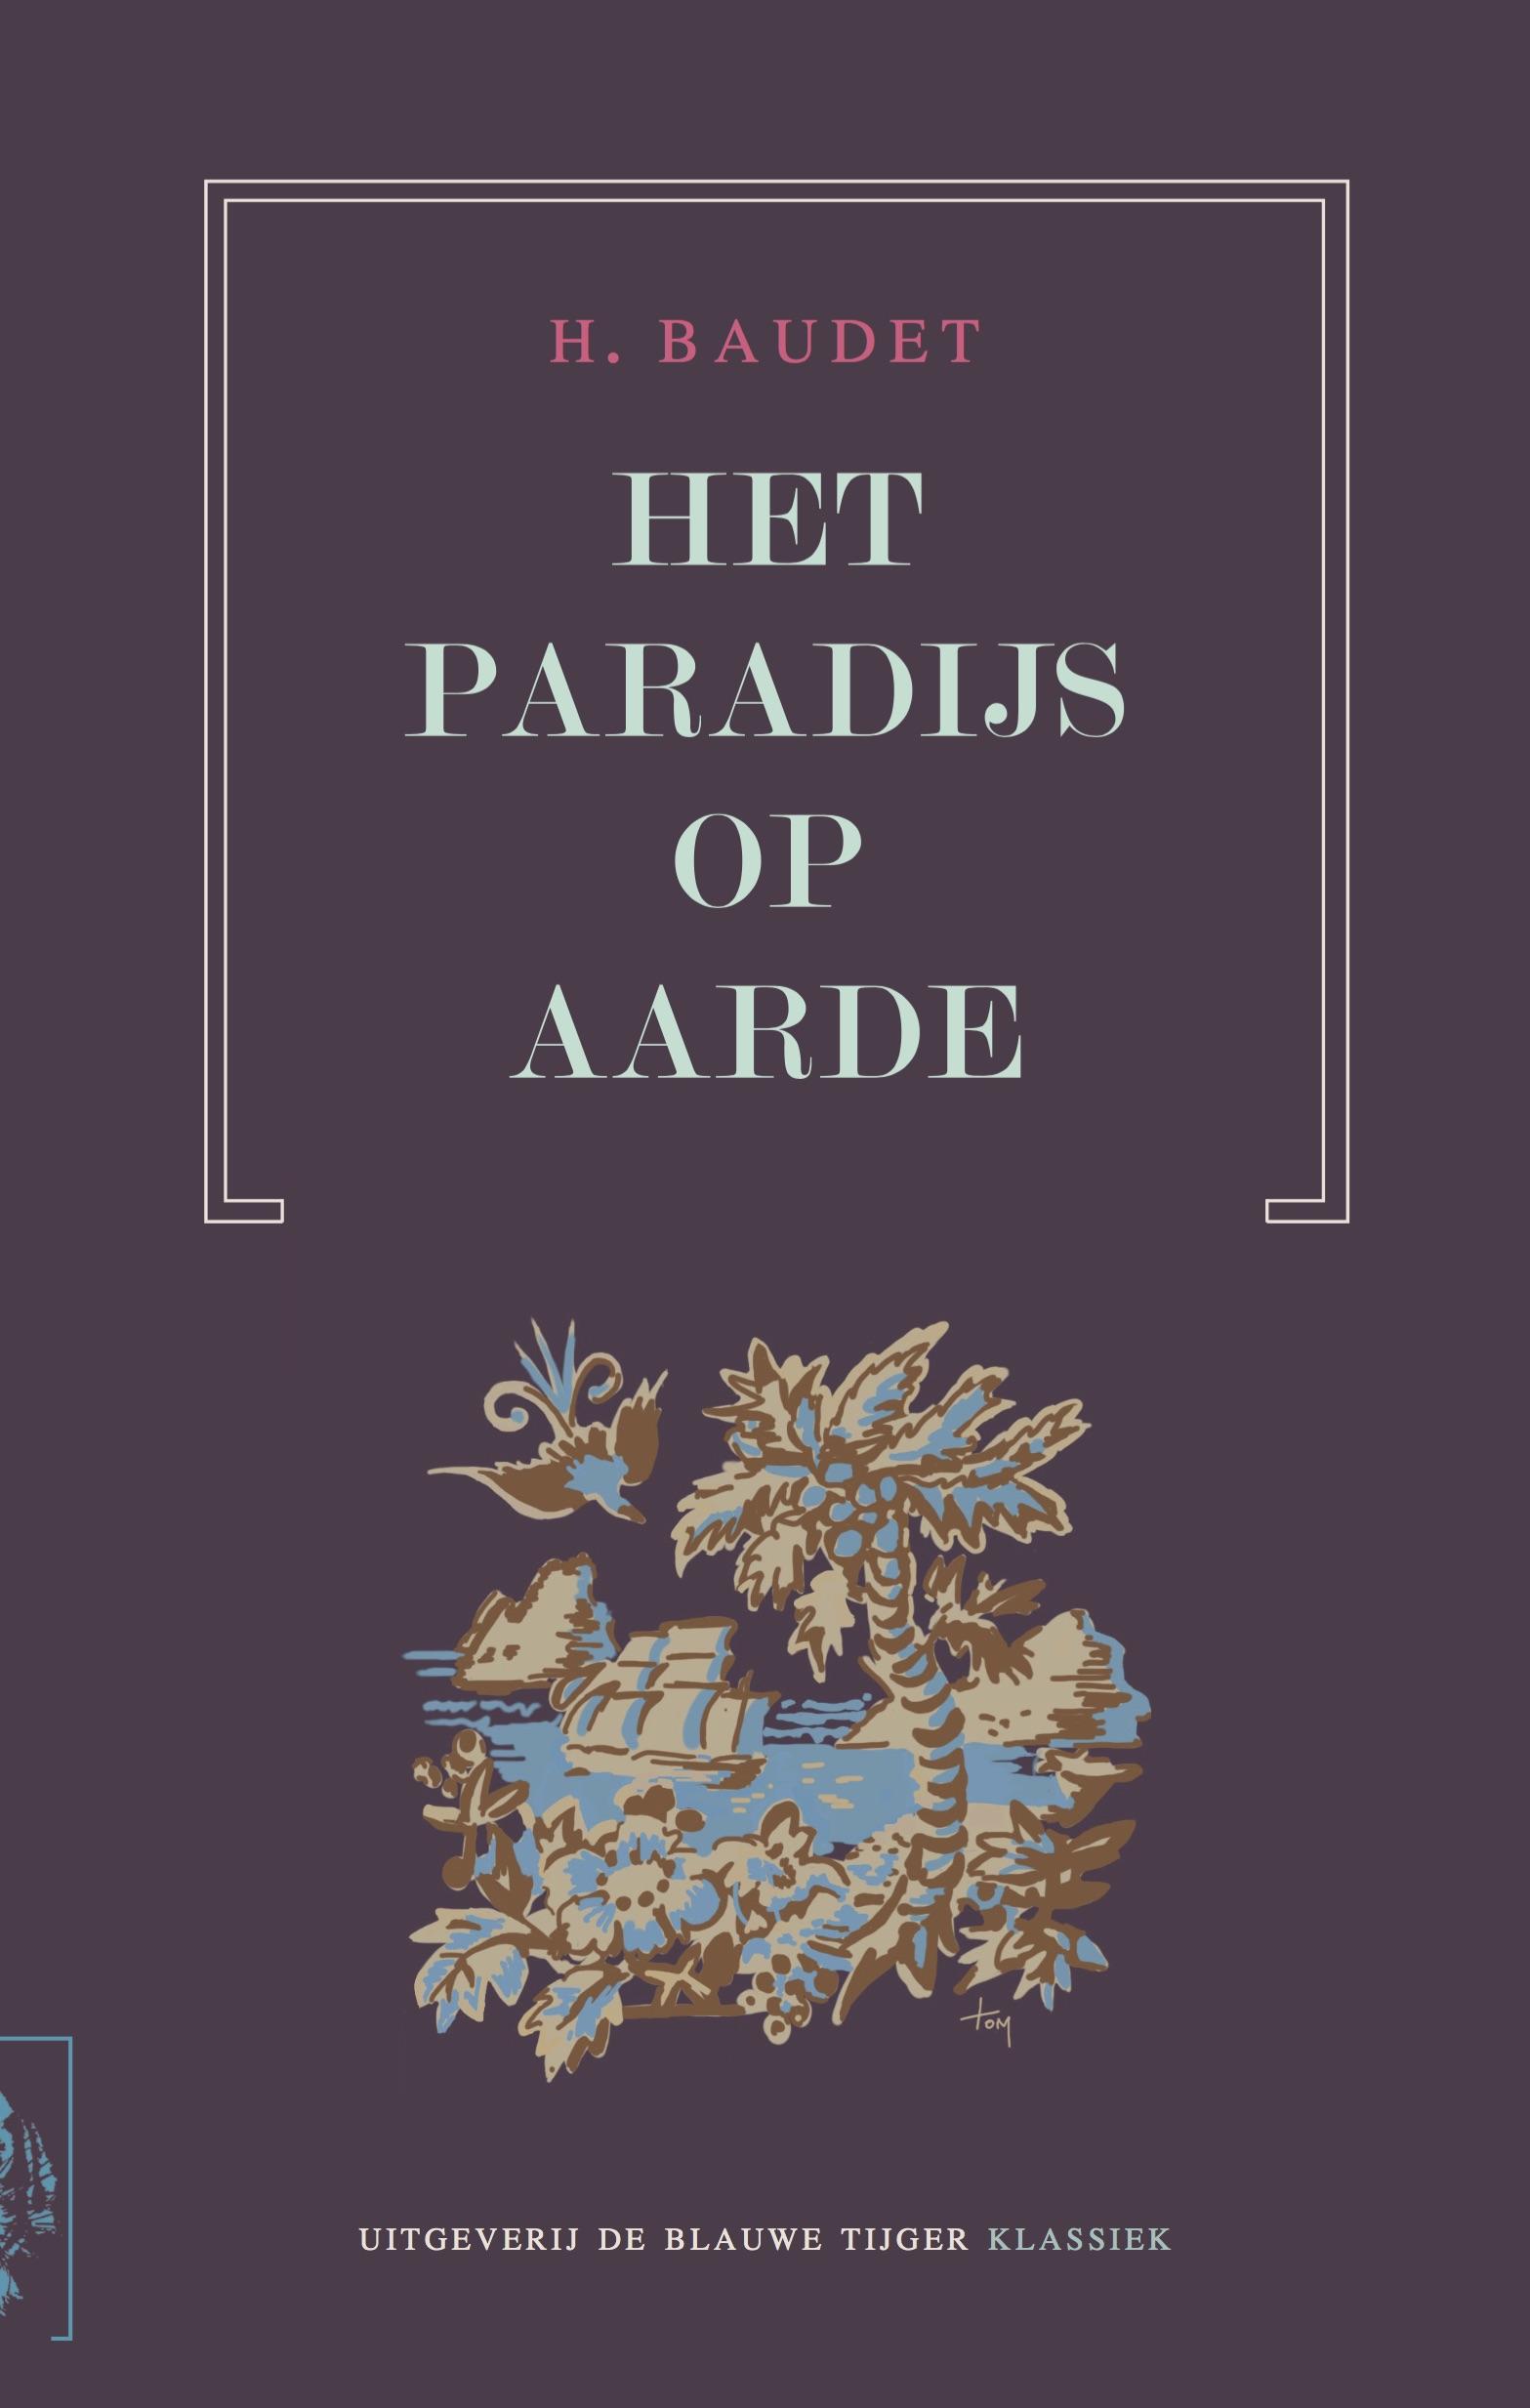 Paradijs-voorkant